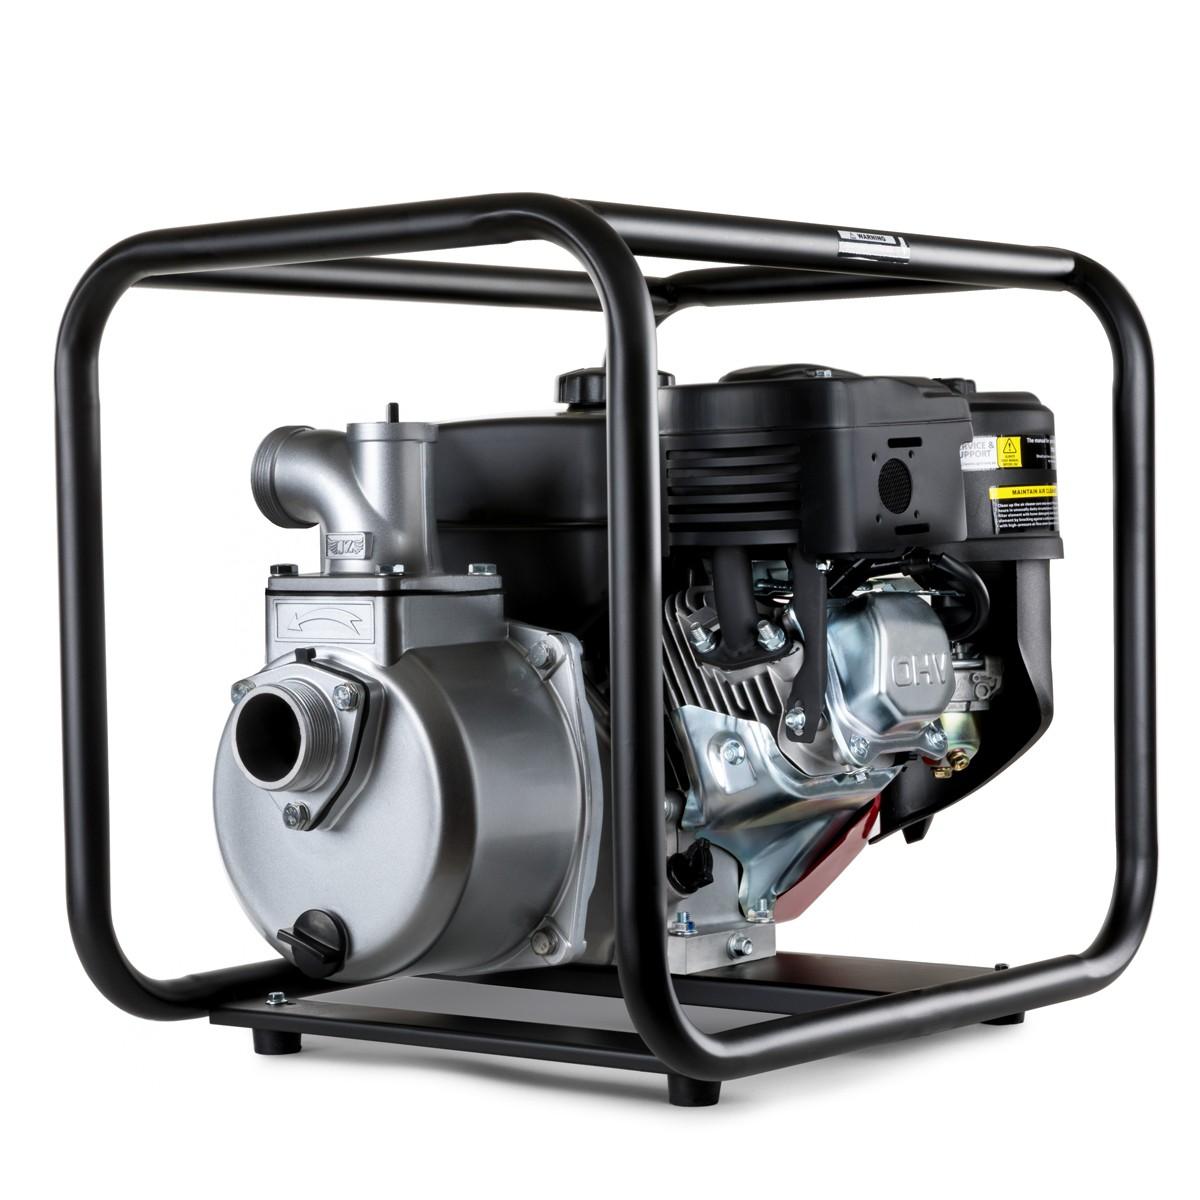 Maquinaria de jardineria bombas de agua 1 diferencia for Bombas de agua electricas de presion